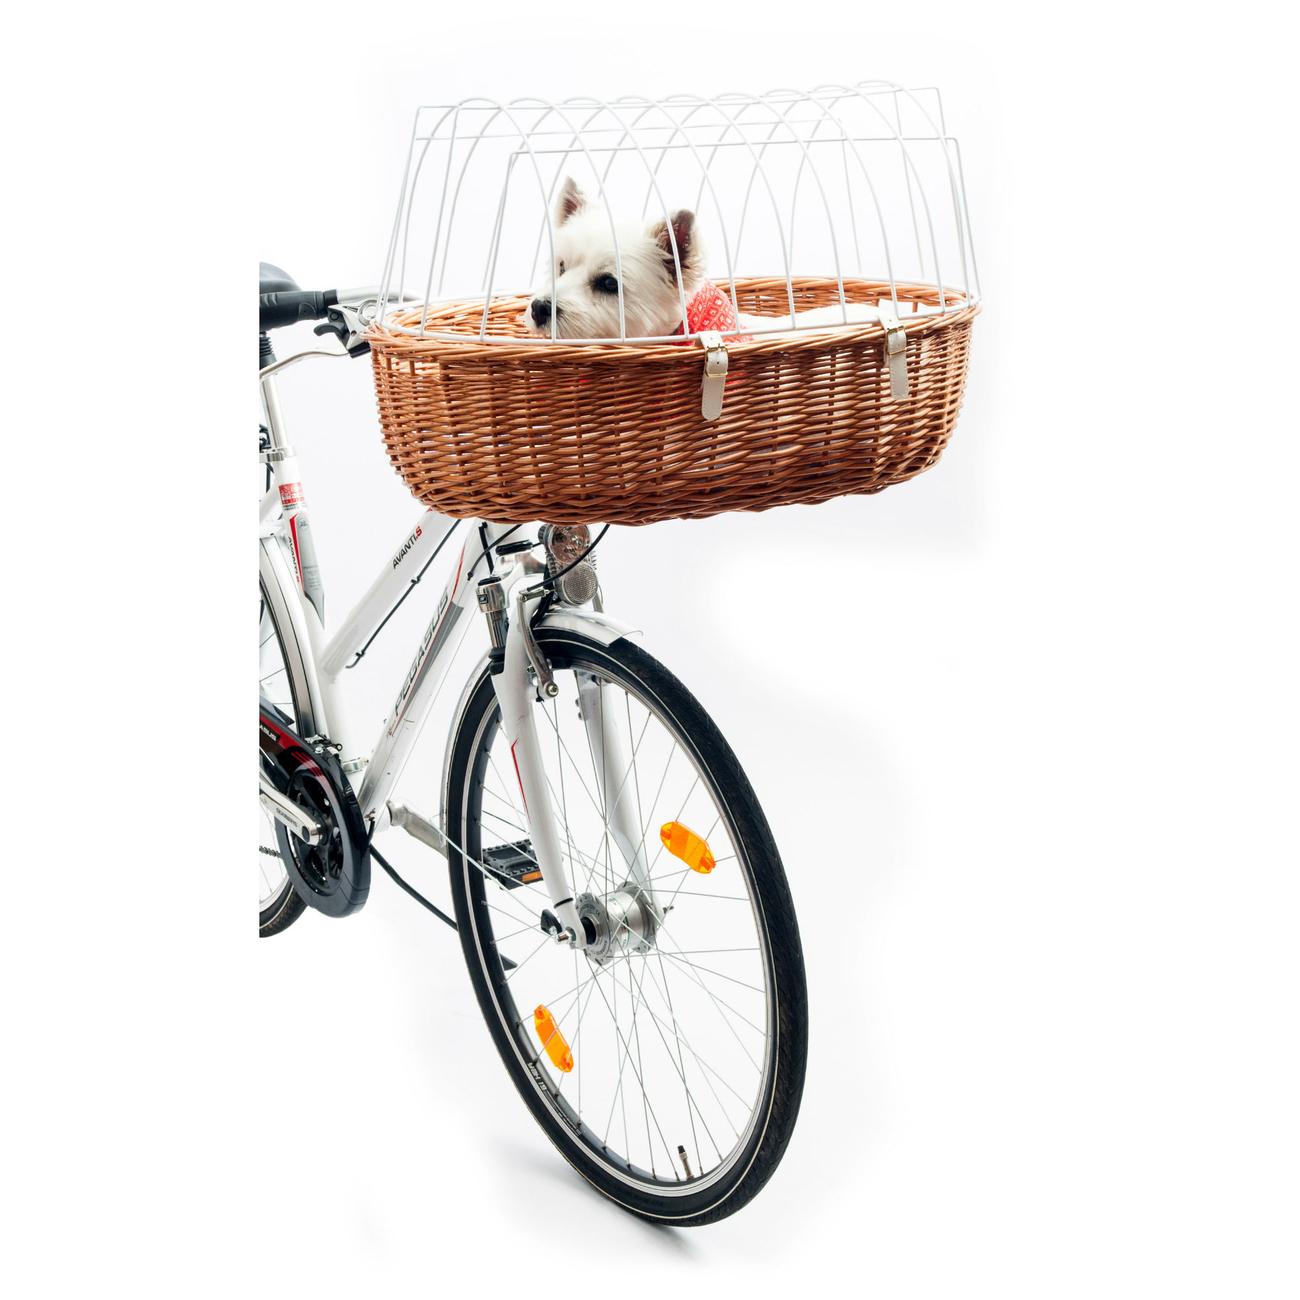 Aumüller E-Bike Hunde Fahrradkorb Standard vorne, Bild 7